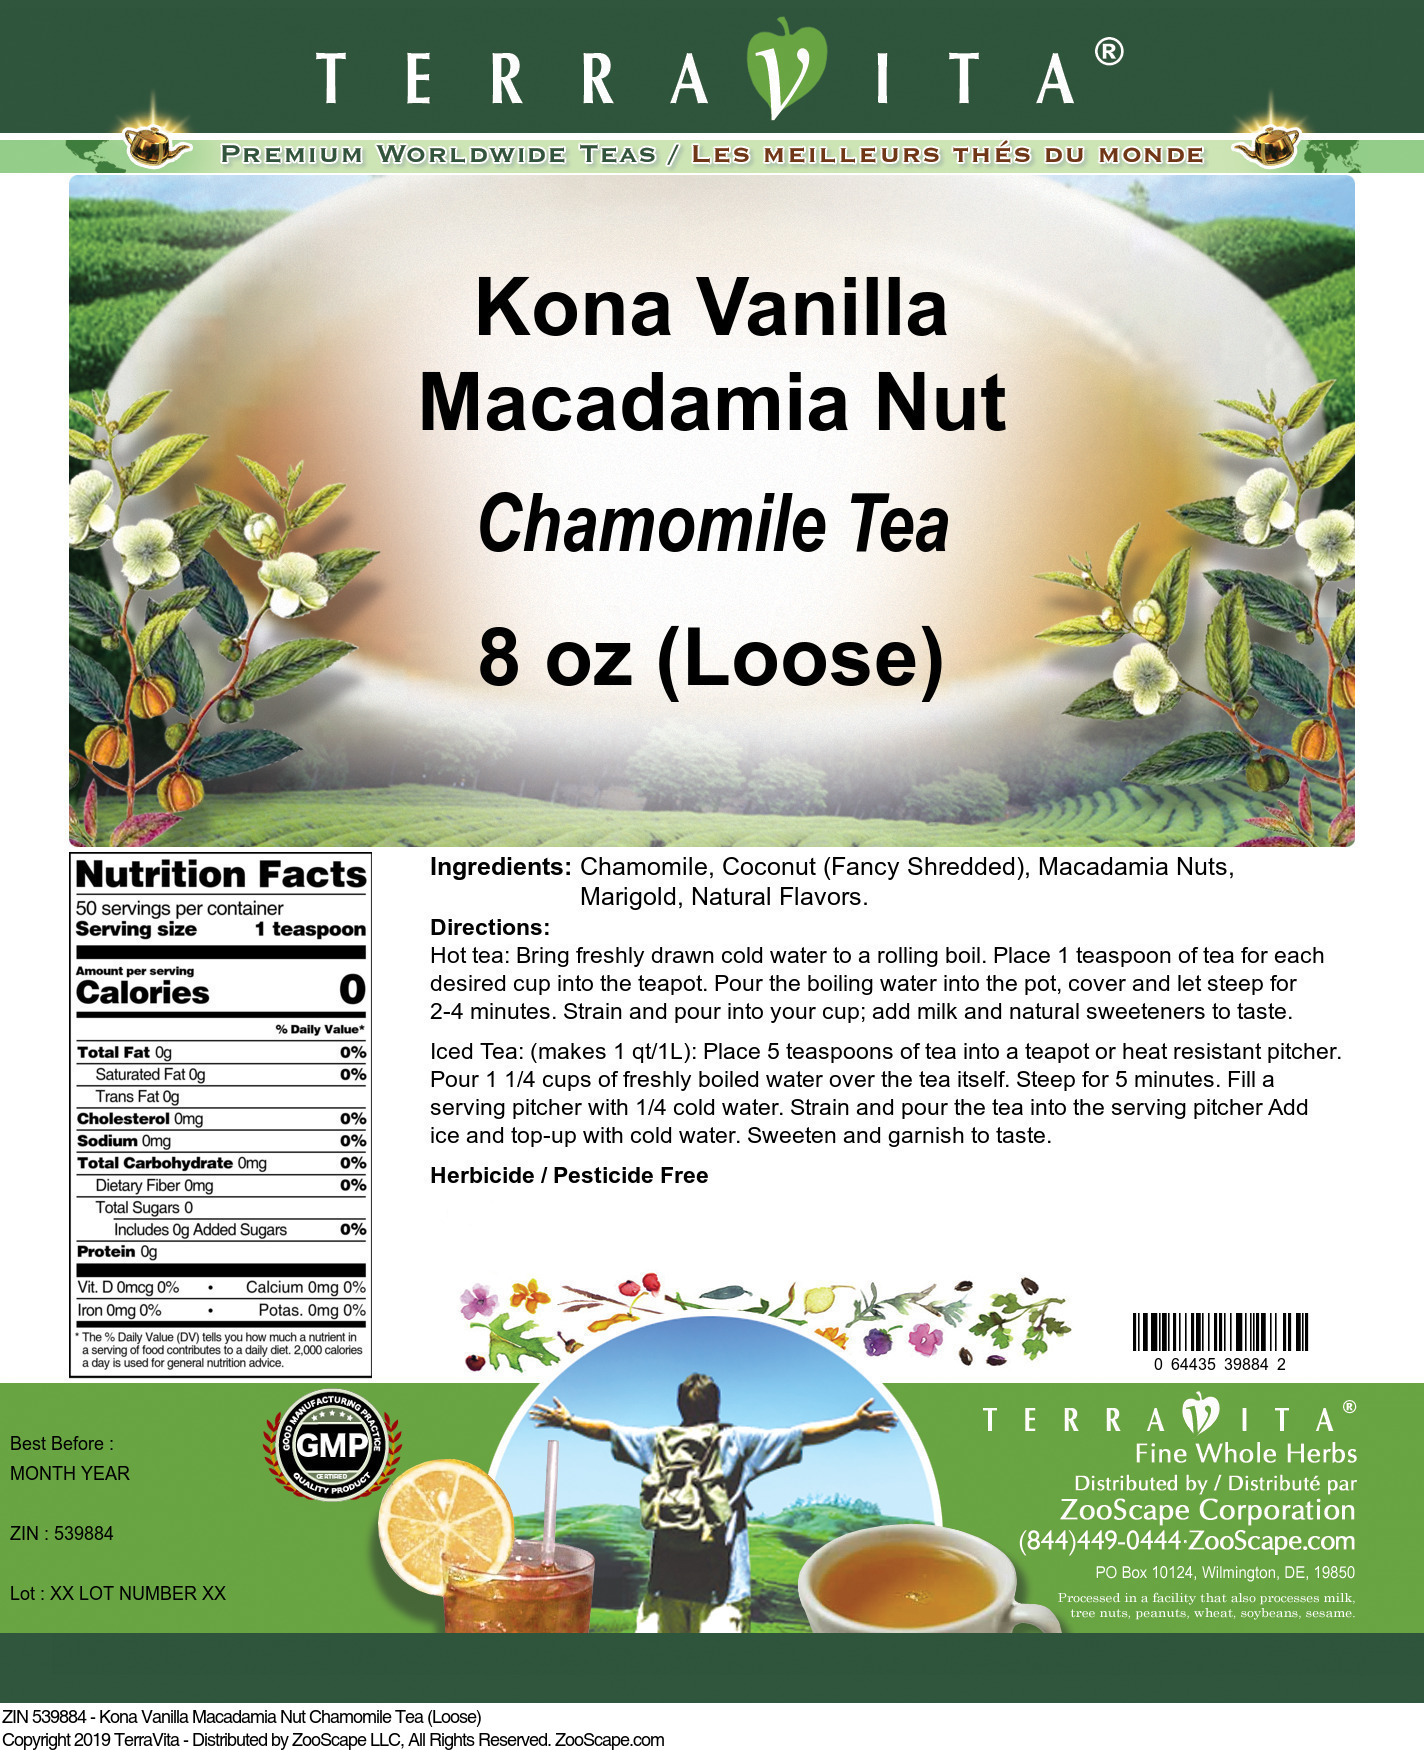 Kona Vanilla Macadamia Nut Chamomile Tea (Loose)